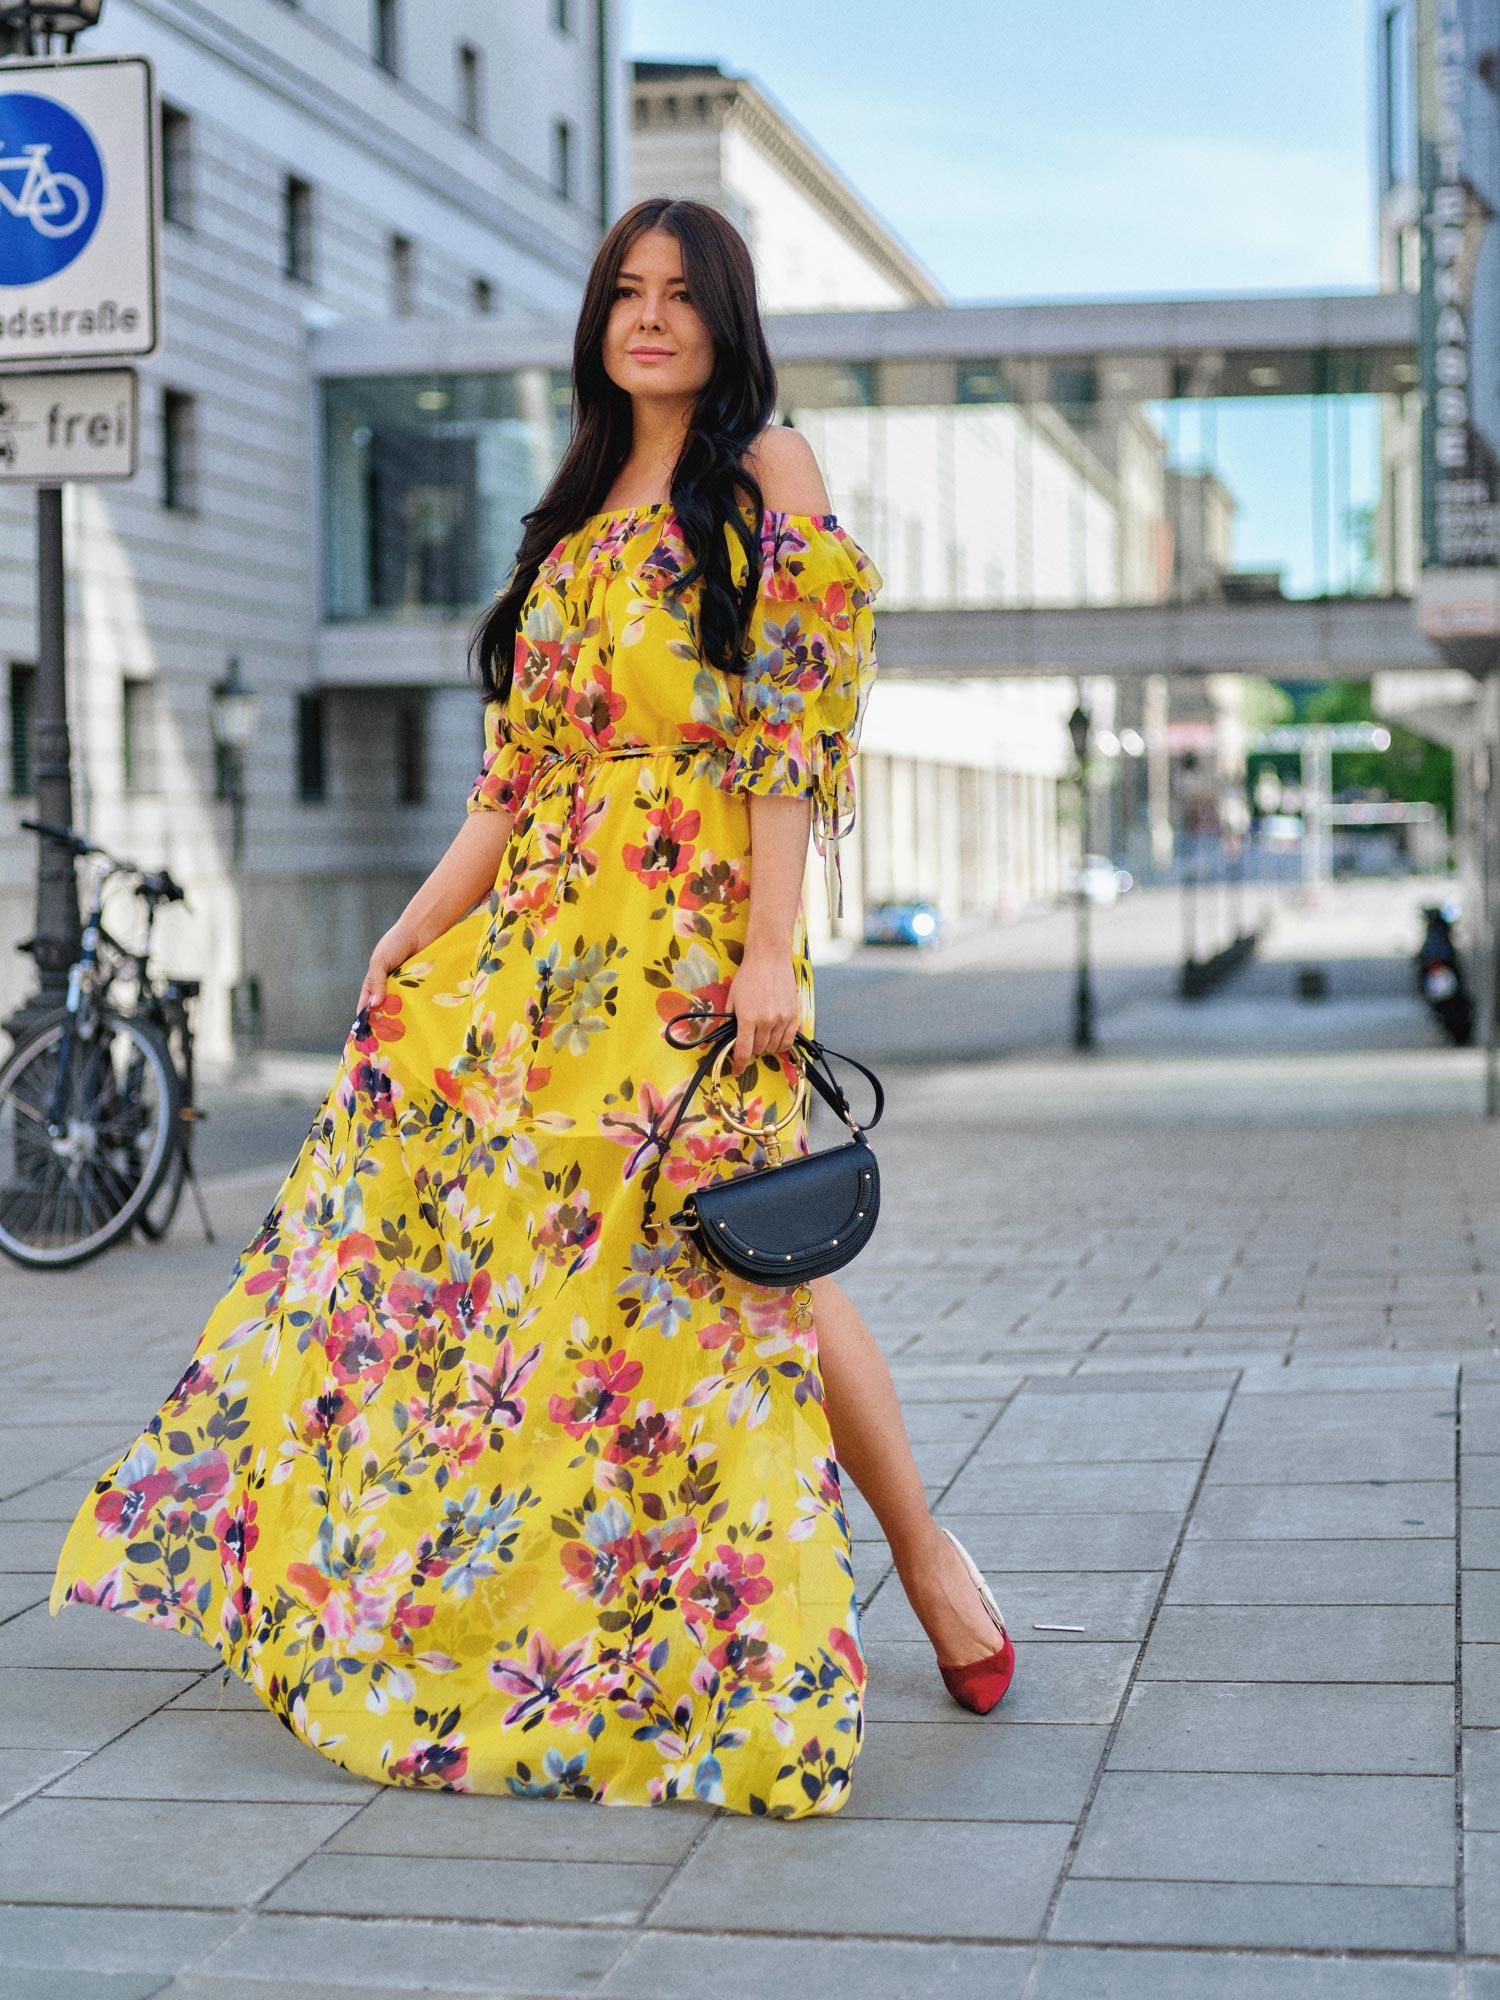 fashion-blogger-aus-muenchen-fashionblogger-lifestyleblogger-beautyblogger-fashion-blogger-modeblogger-modeblog-munich-blog-muenchen-sommer-kleider-maxi